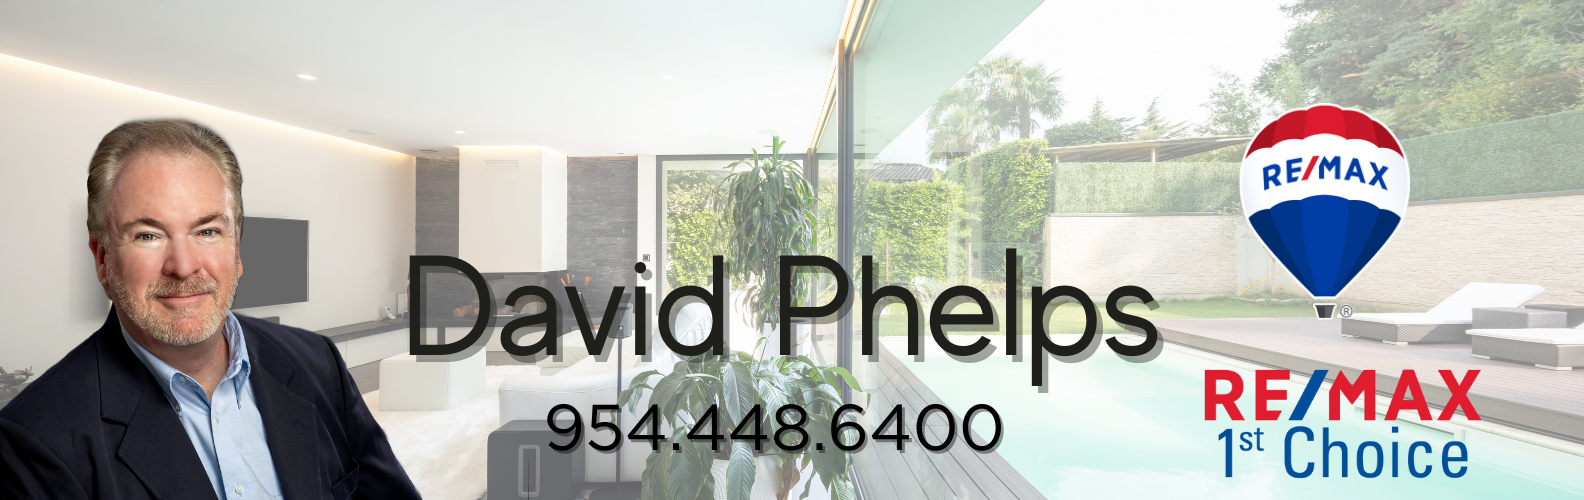 David Phelps 954.448.6400